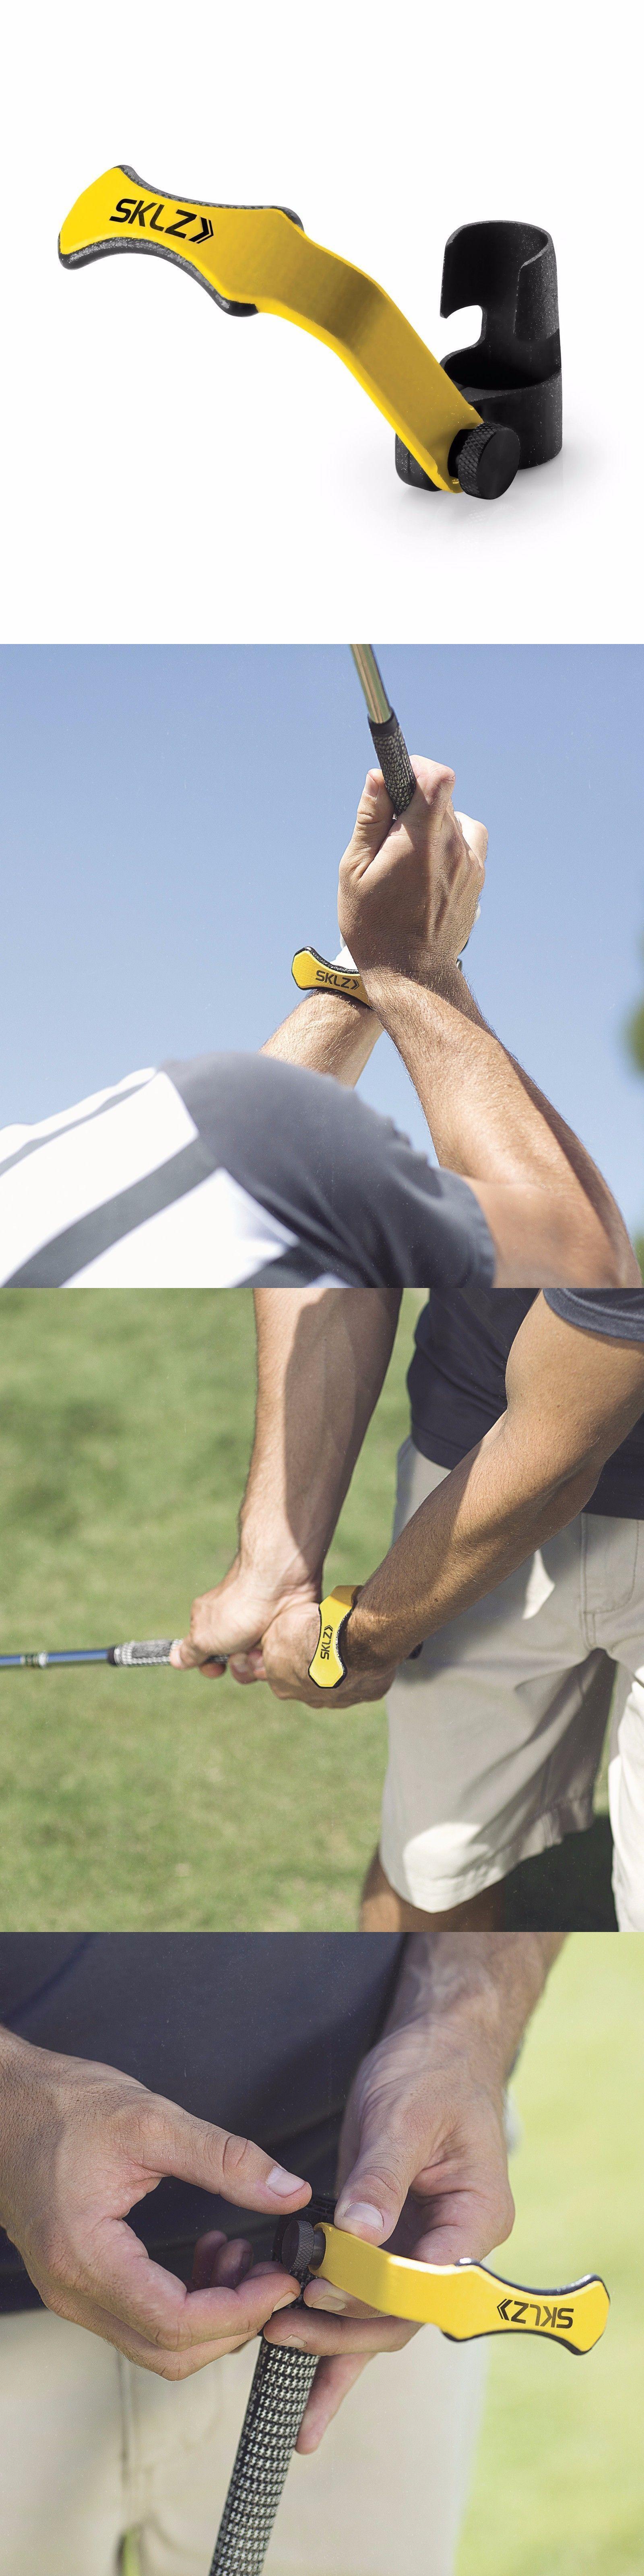 Swing Trainers 83037 Sklz Hinge Helper Promotes Wrist Correct Wrist Hinge Golf Training Aid Buy It Now Only 30 5 Golf Training Swing Trainer Golf Swing